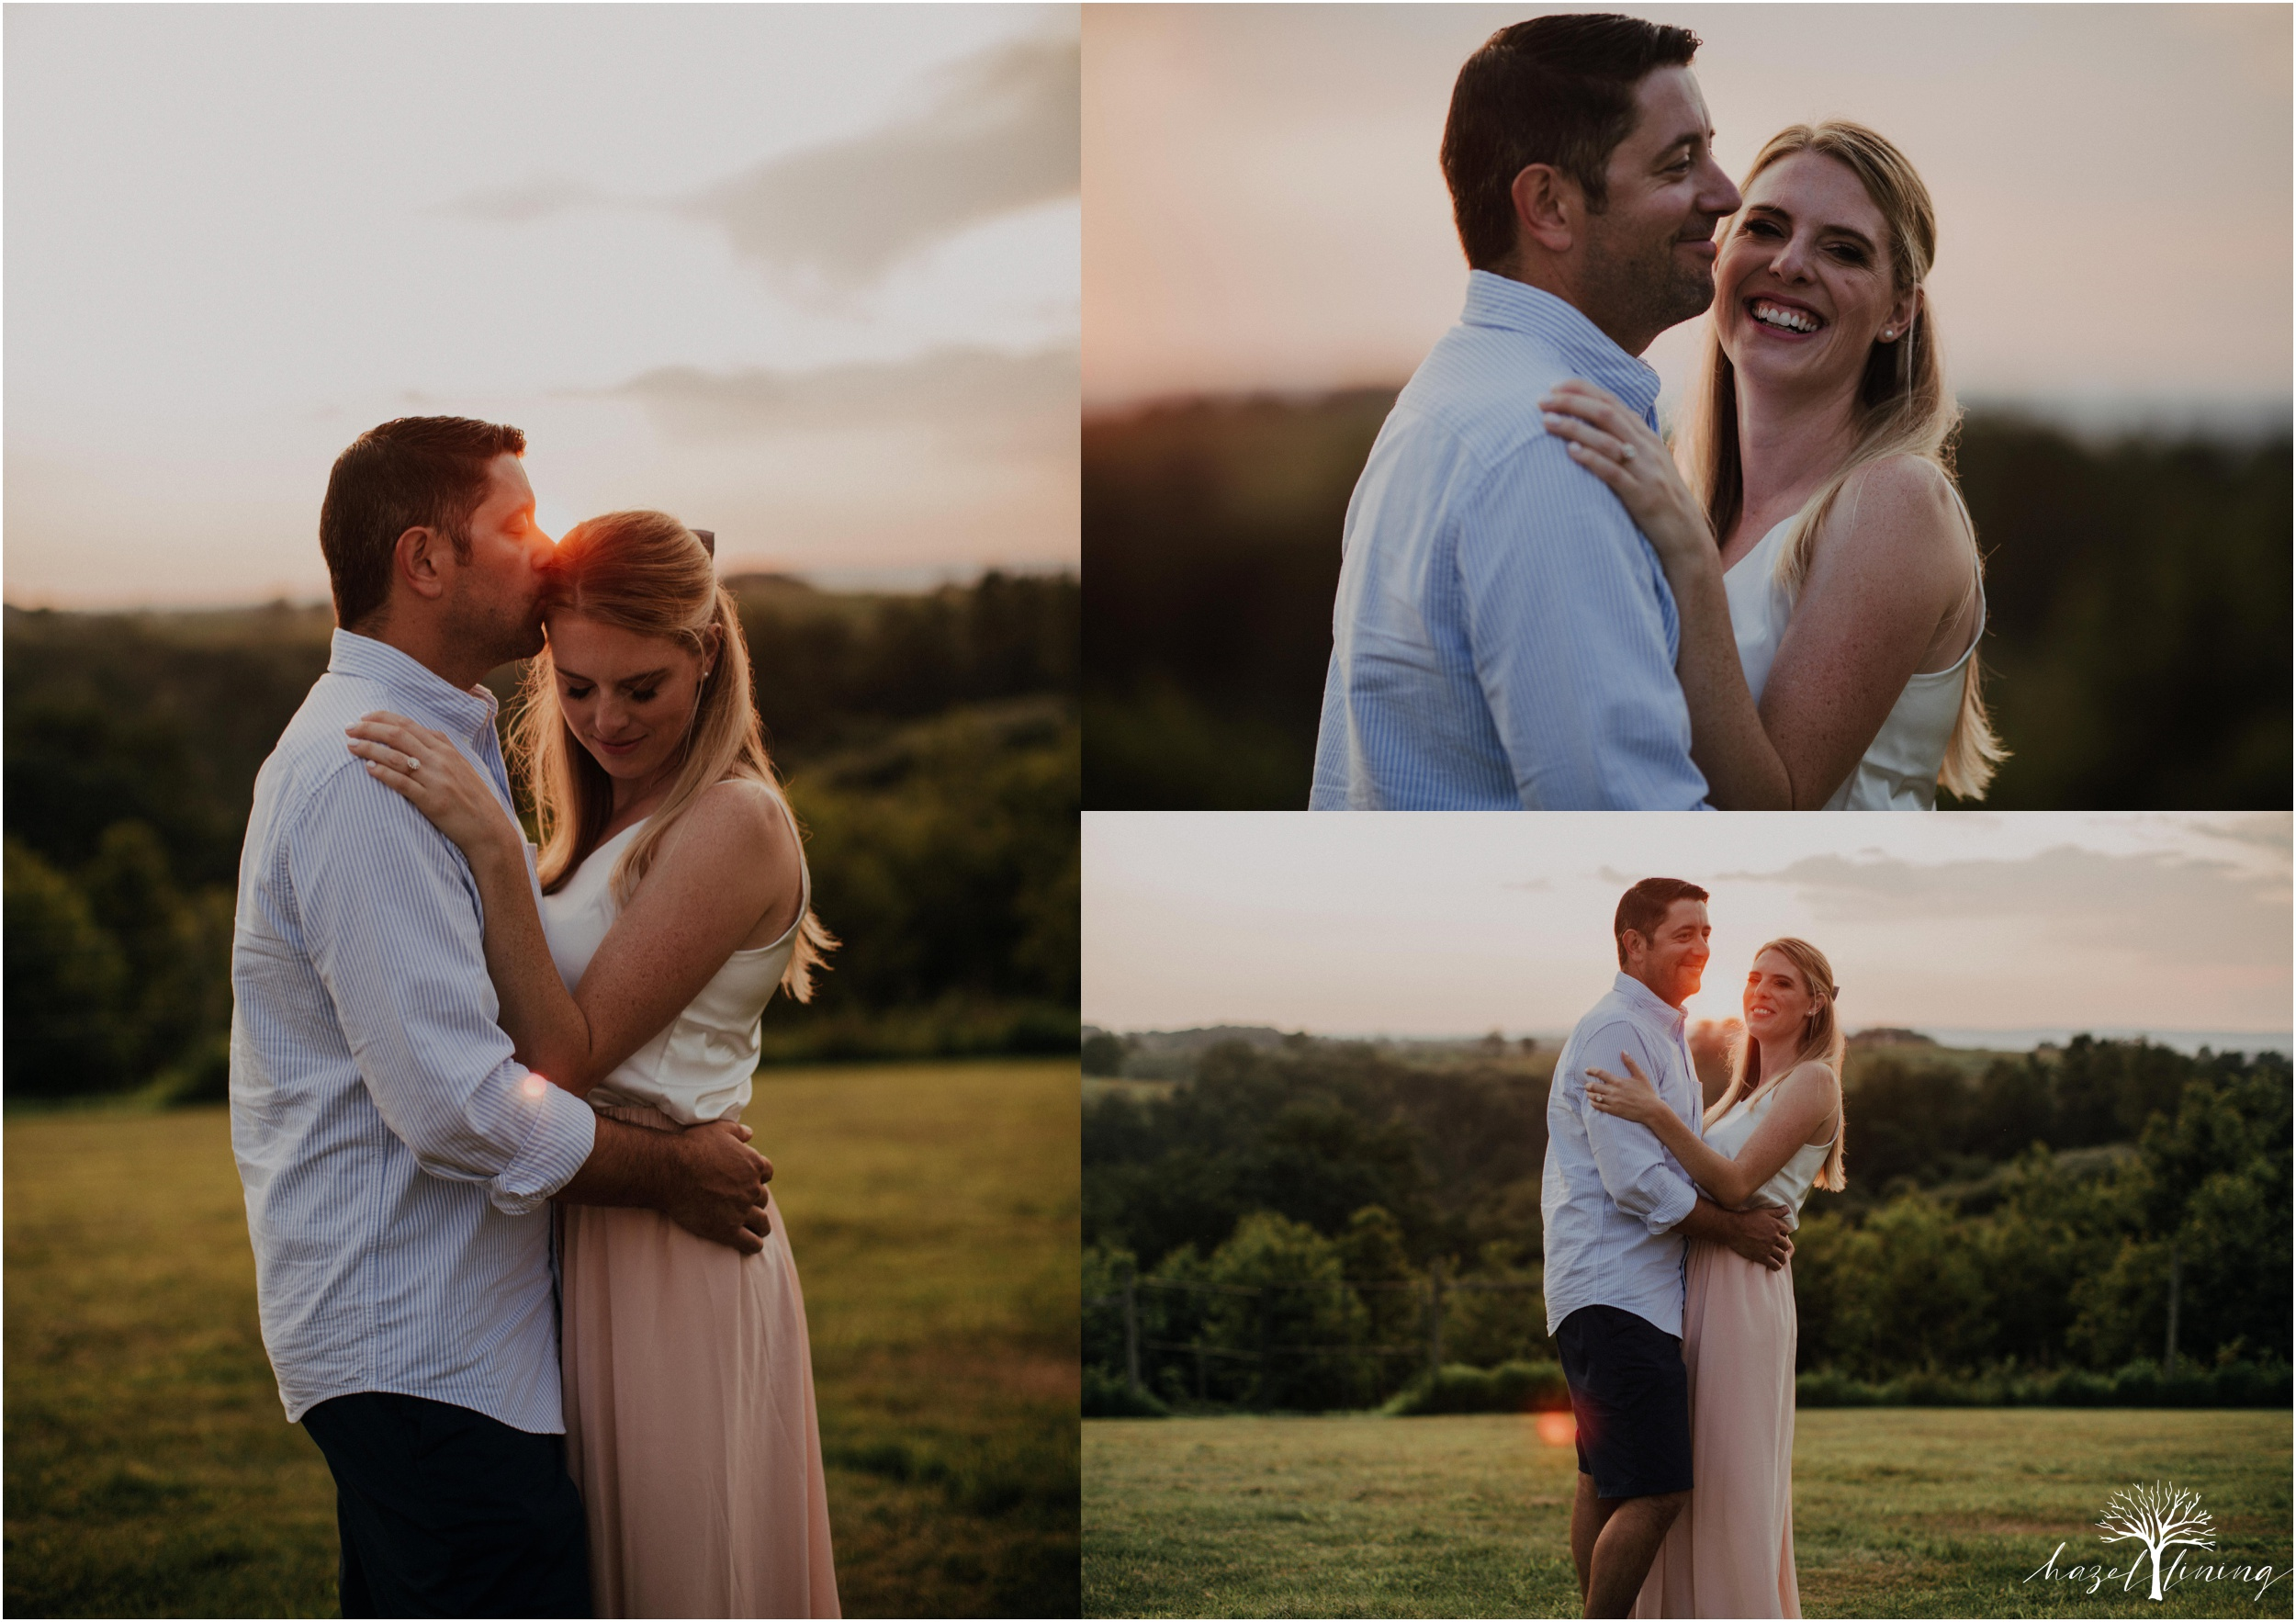 ashley-fillmore-steve-reimer-trexler-nature-preserve-summer-engagement-session-schnecksville-pennsylvania-hazel-lining-photography-destination-elopement-wedding-engagement-photography_0043.jpg